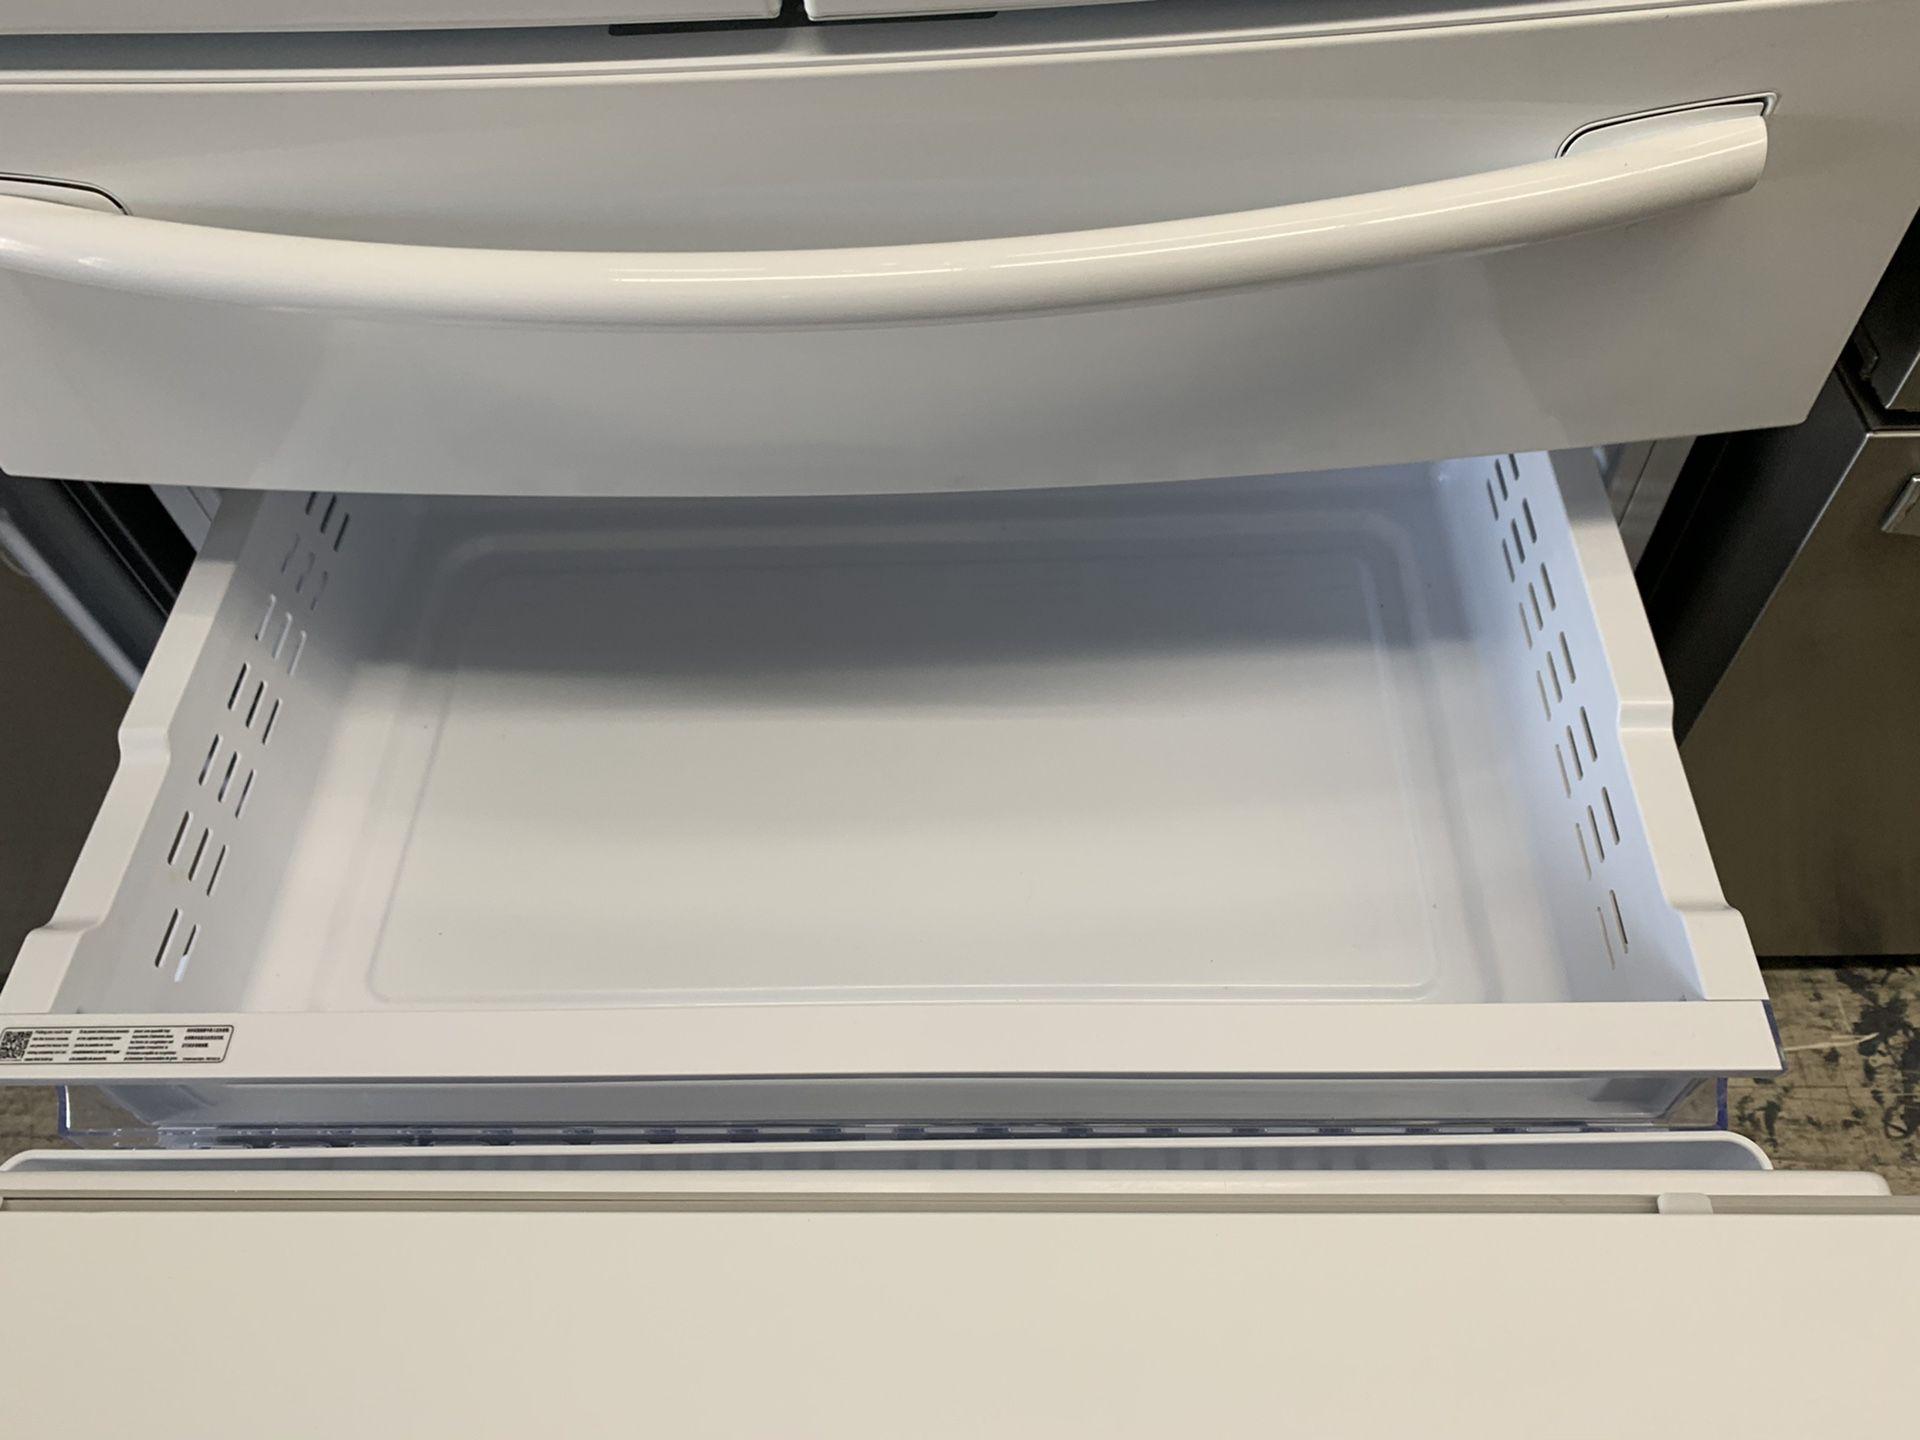 Samsung 4 door fridge in glossy white